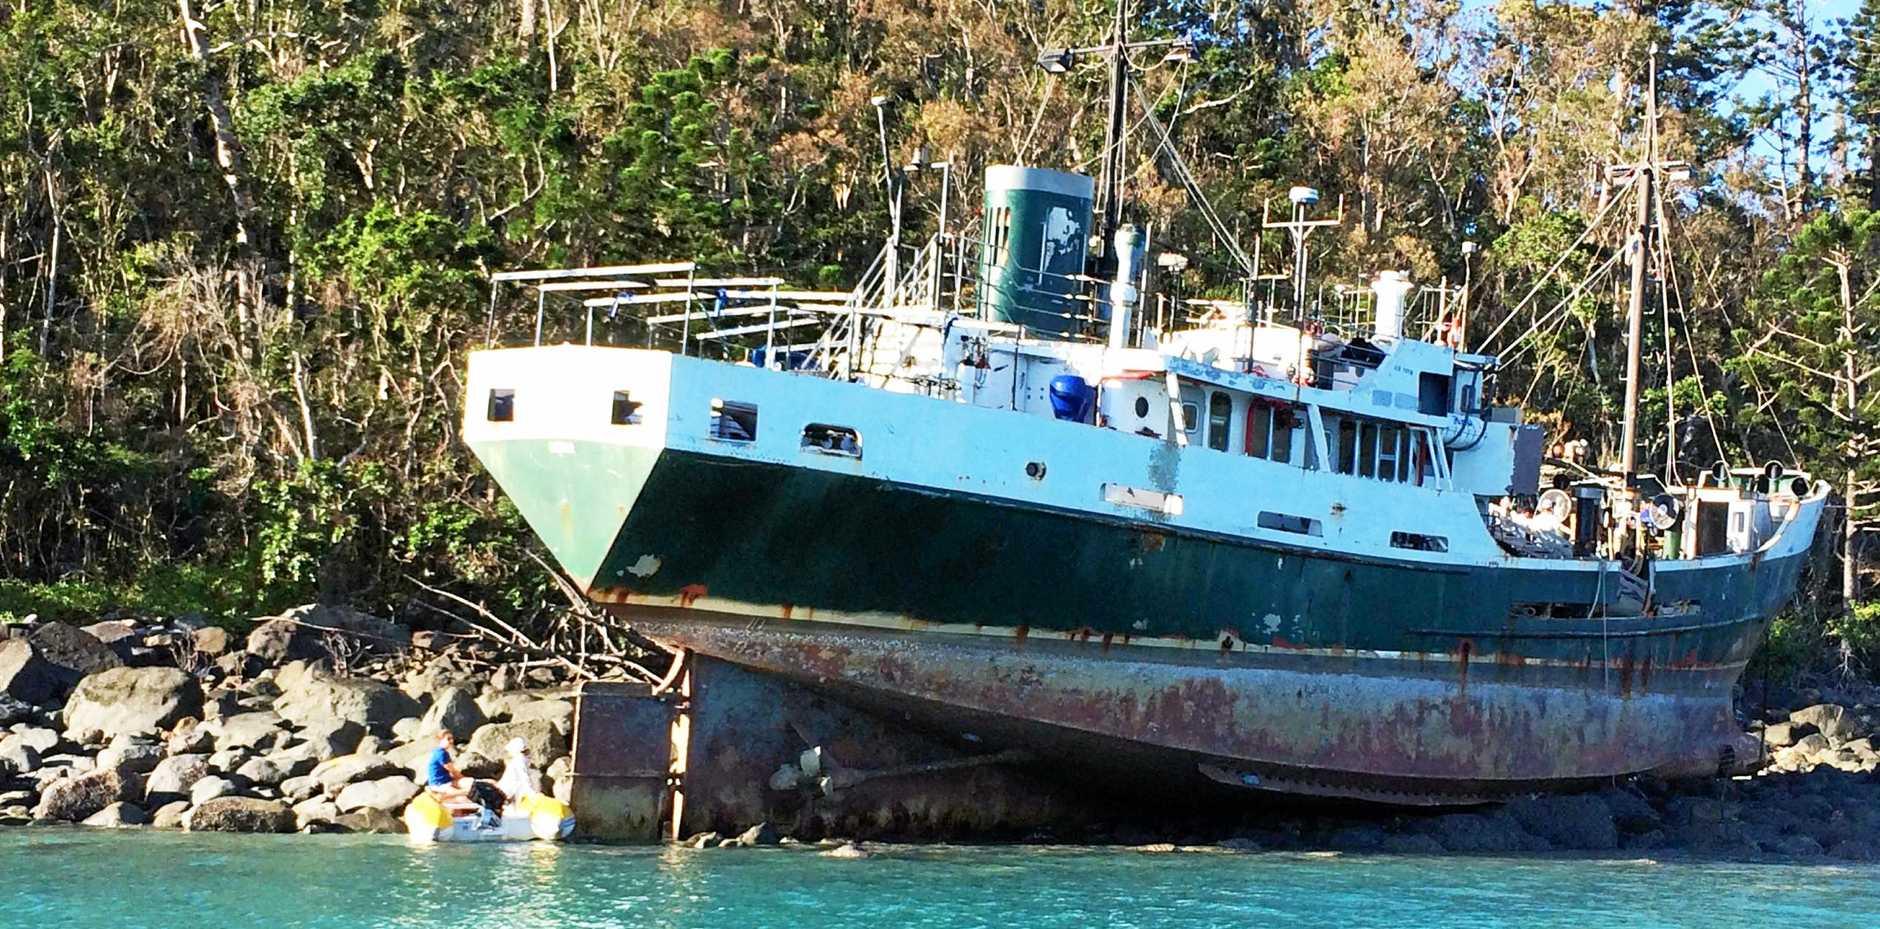 The former Australian Navy ship the MV Banks is still stuck on Whitsunday Island at Cid Harbour.